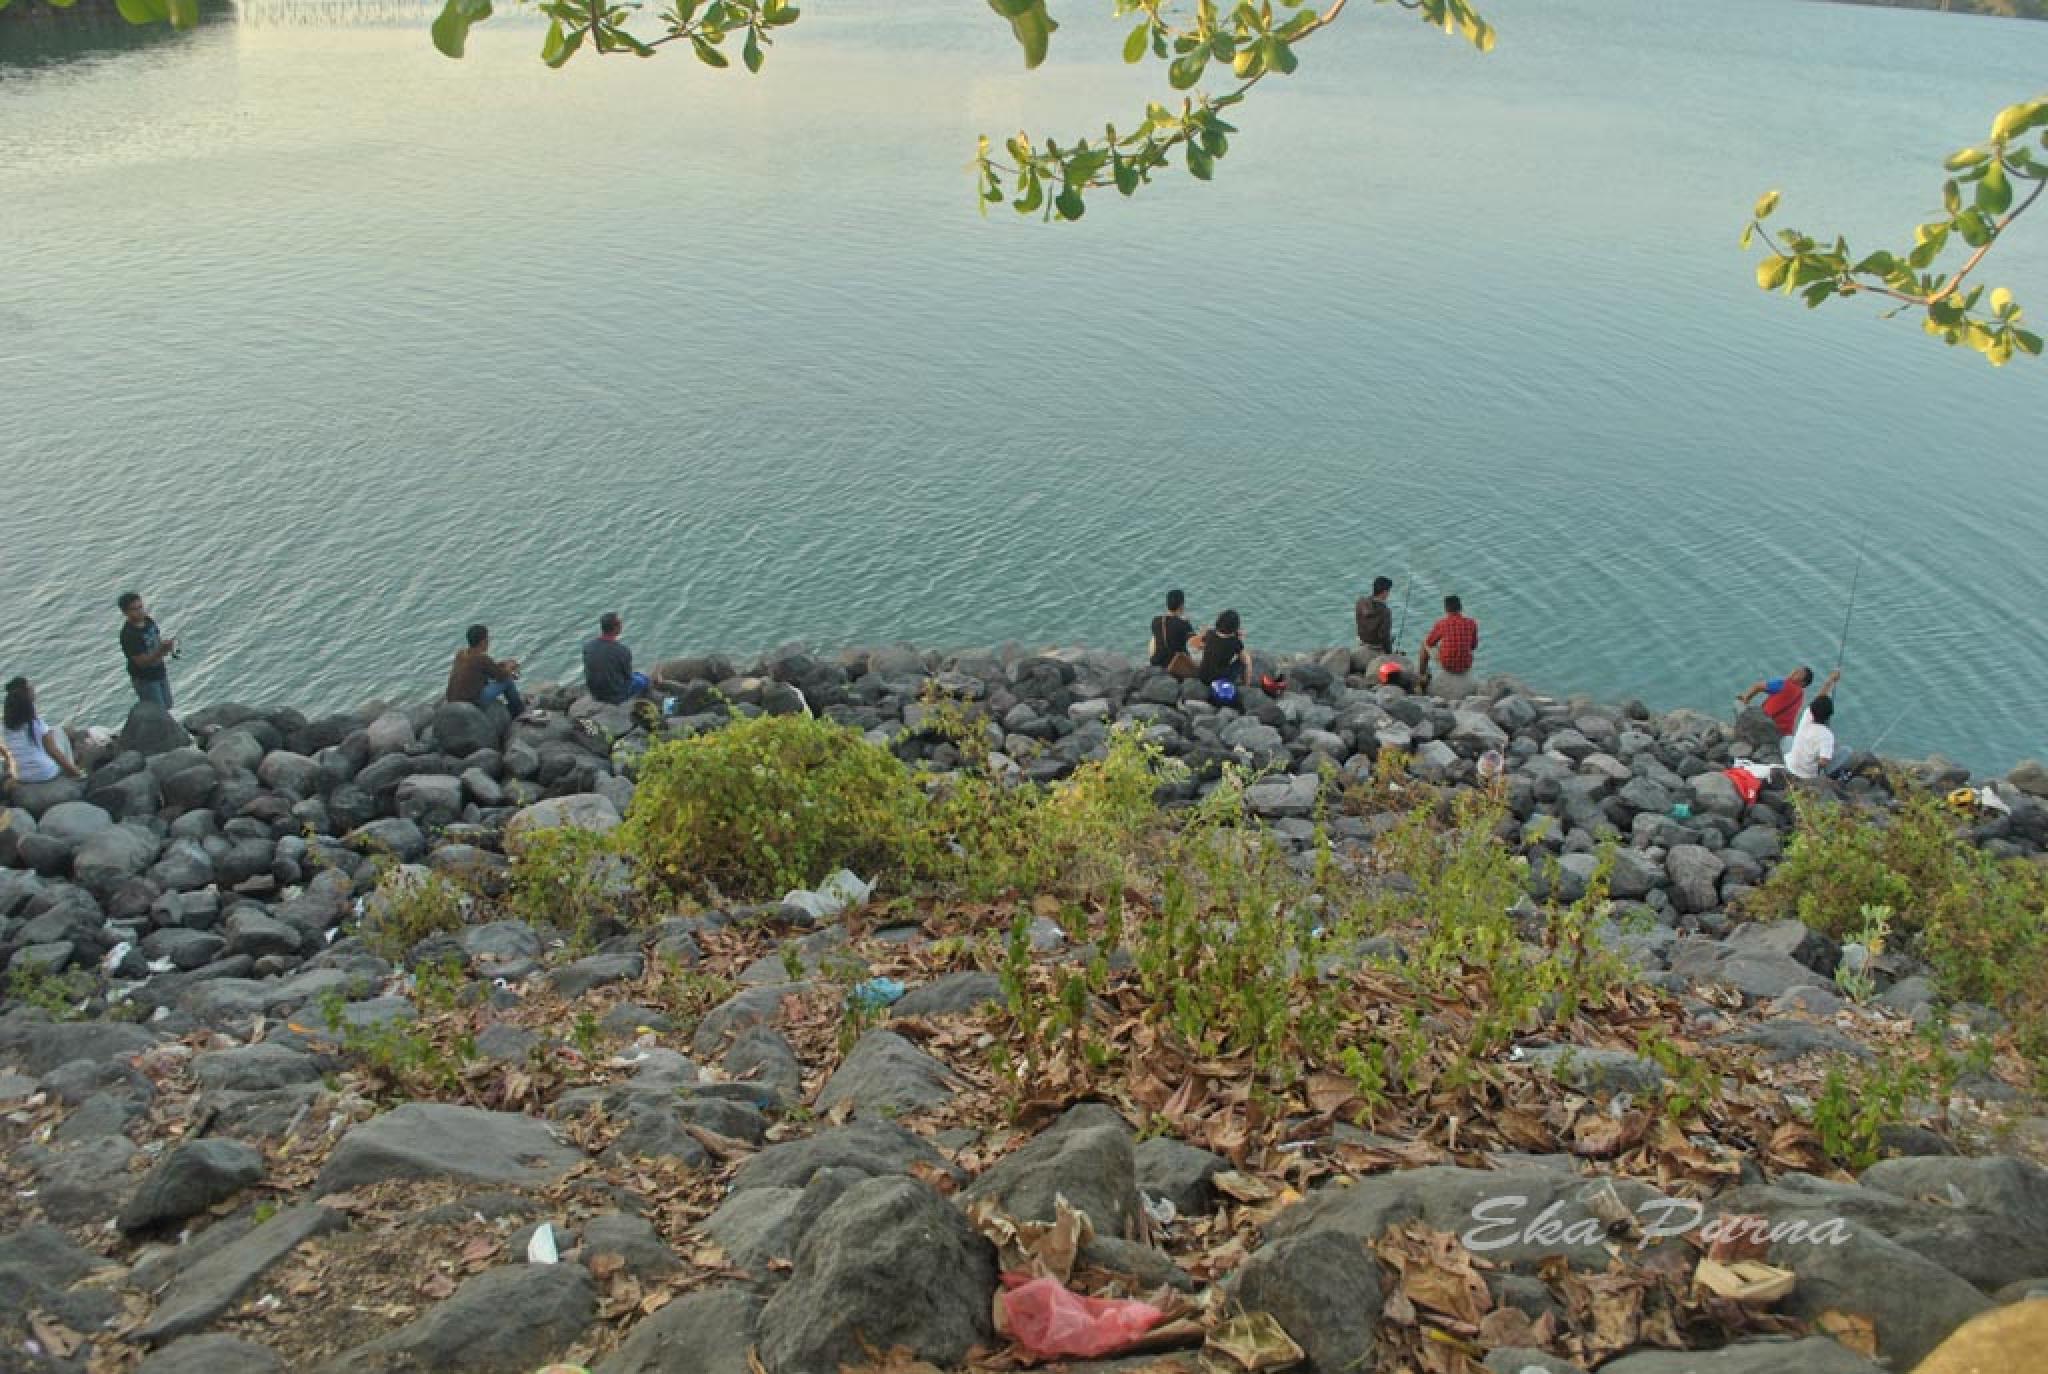 Serangan Island by Eka Purna Sumeika